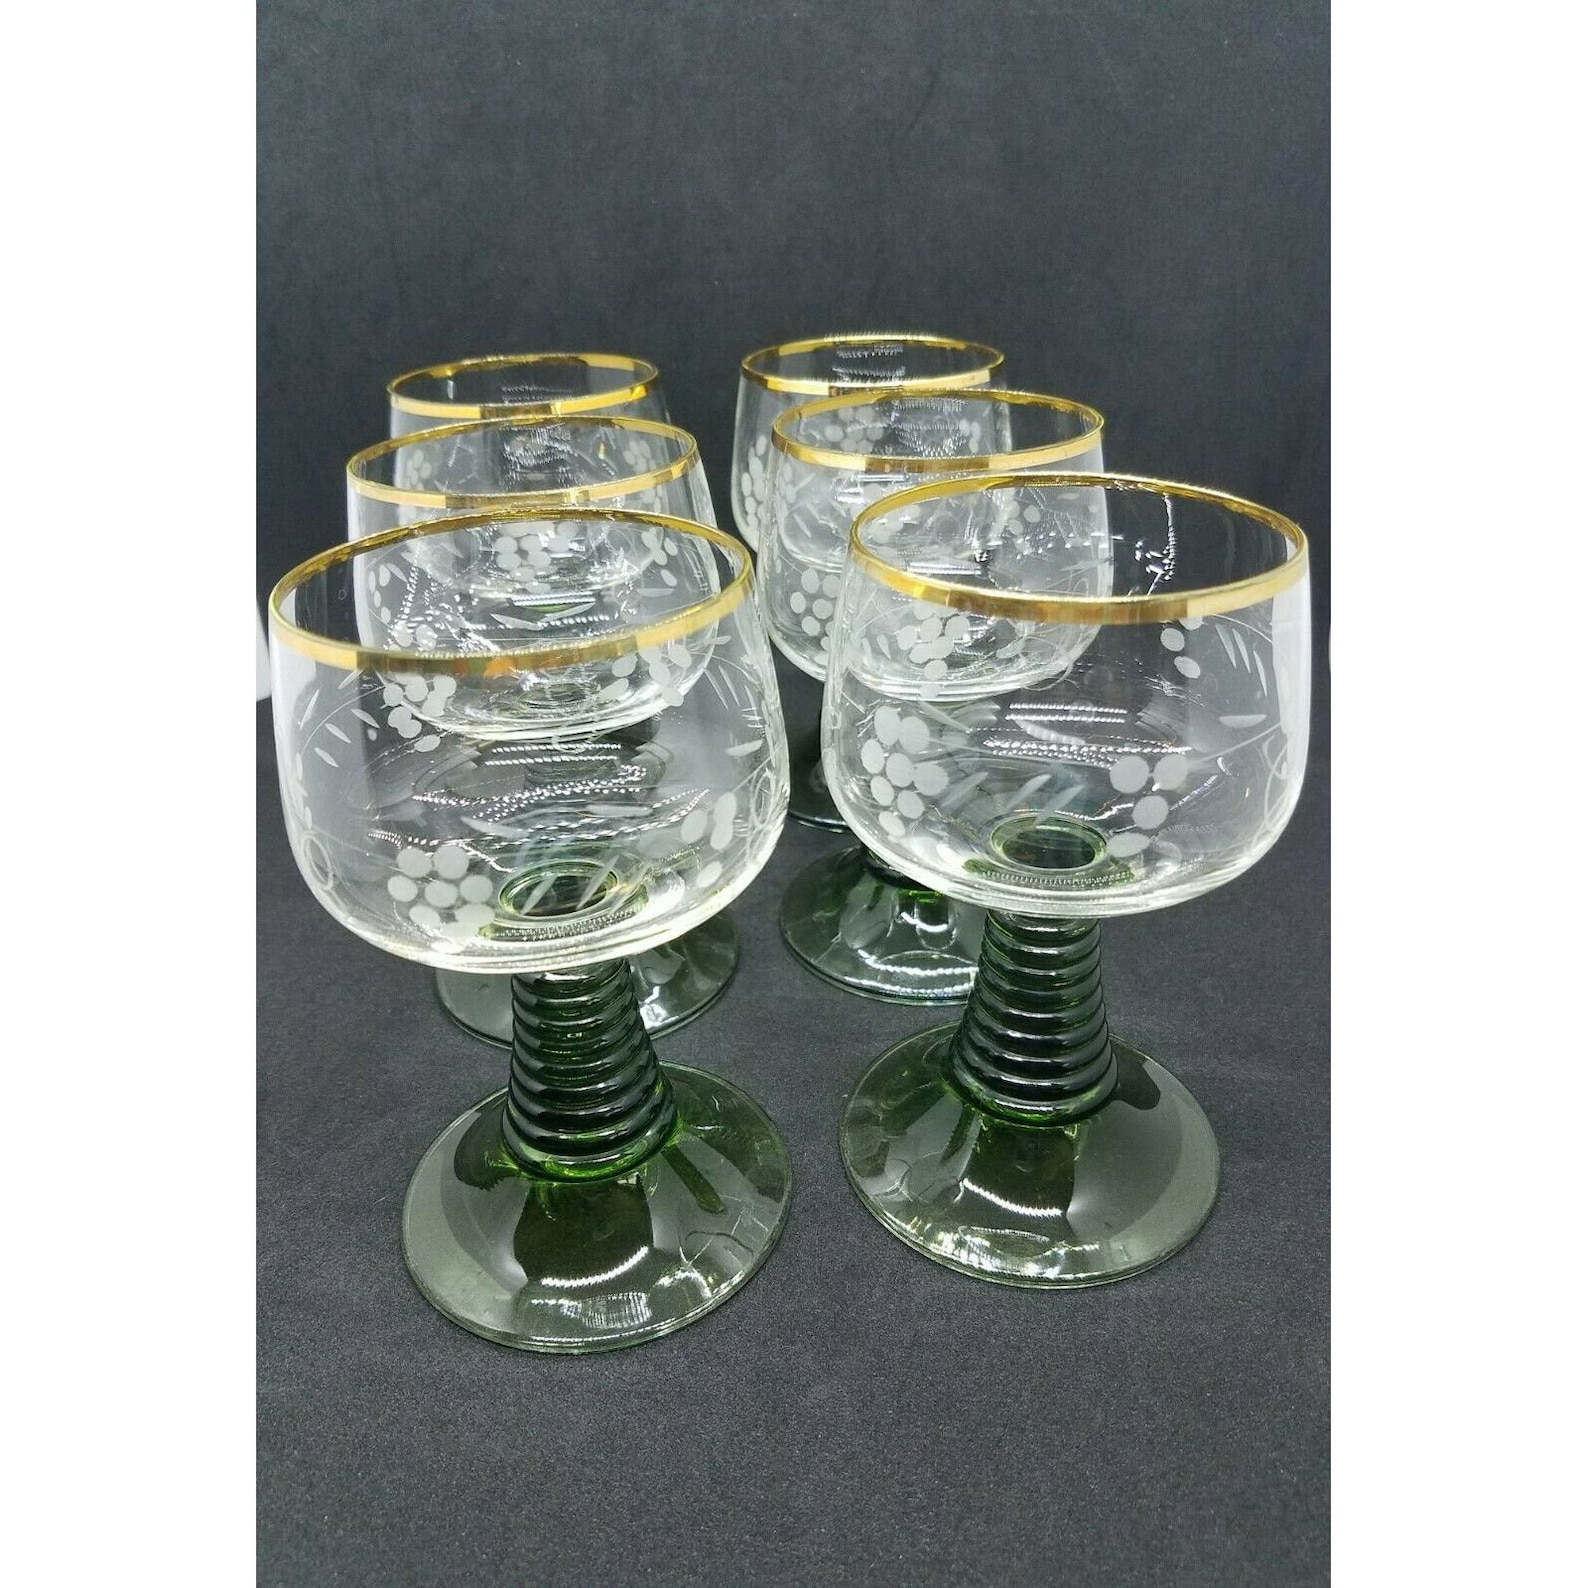 6 Römer wine glasses